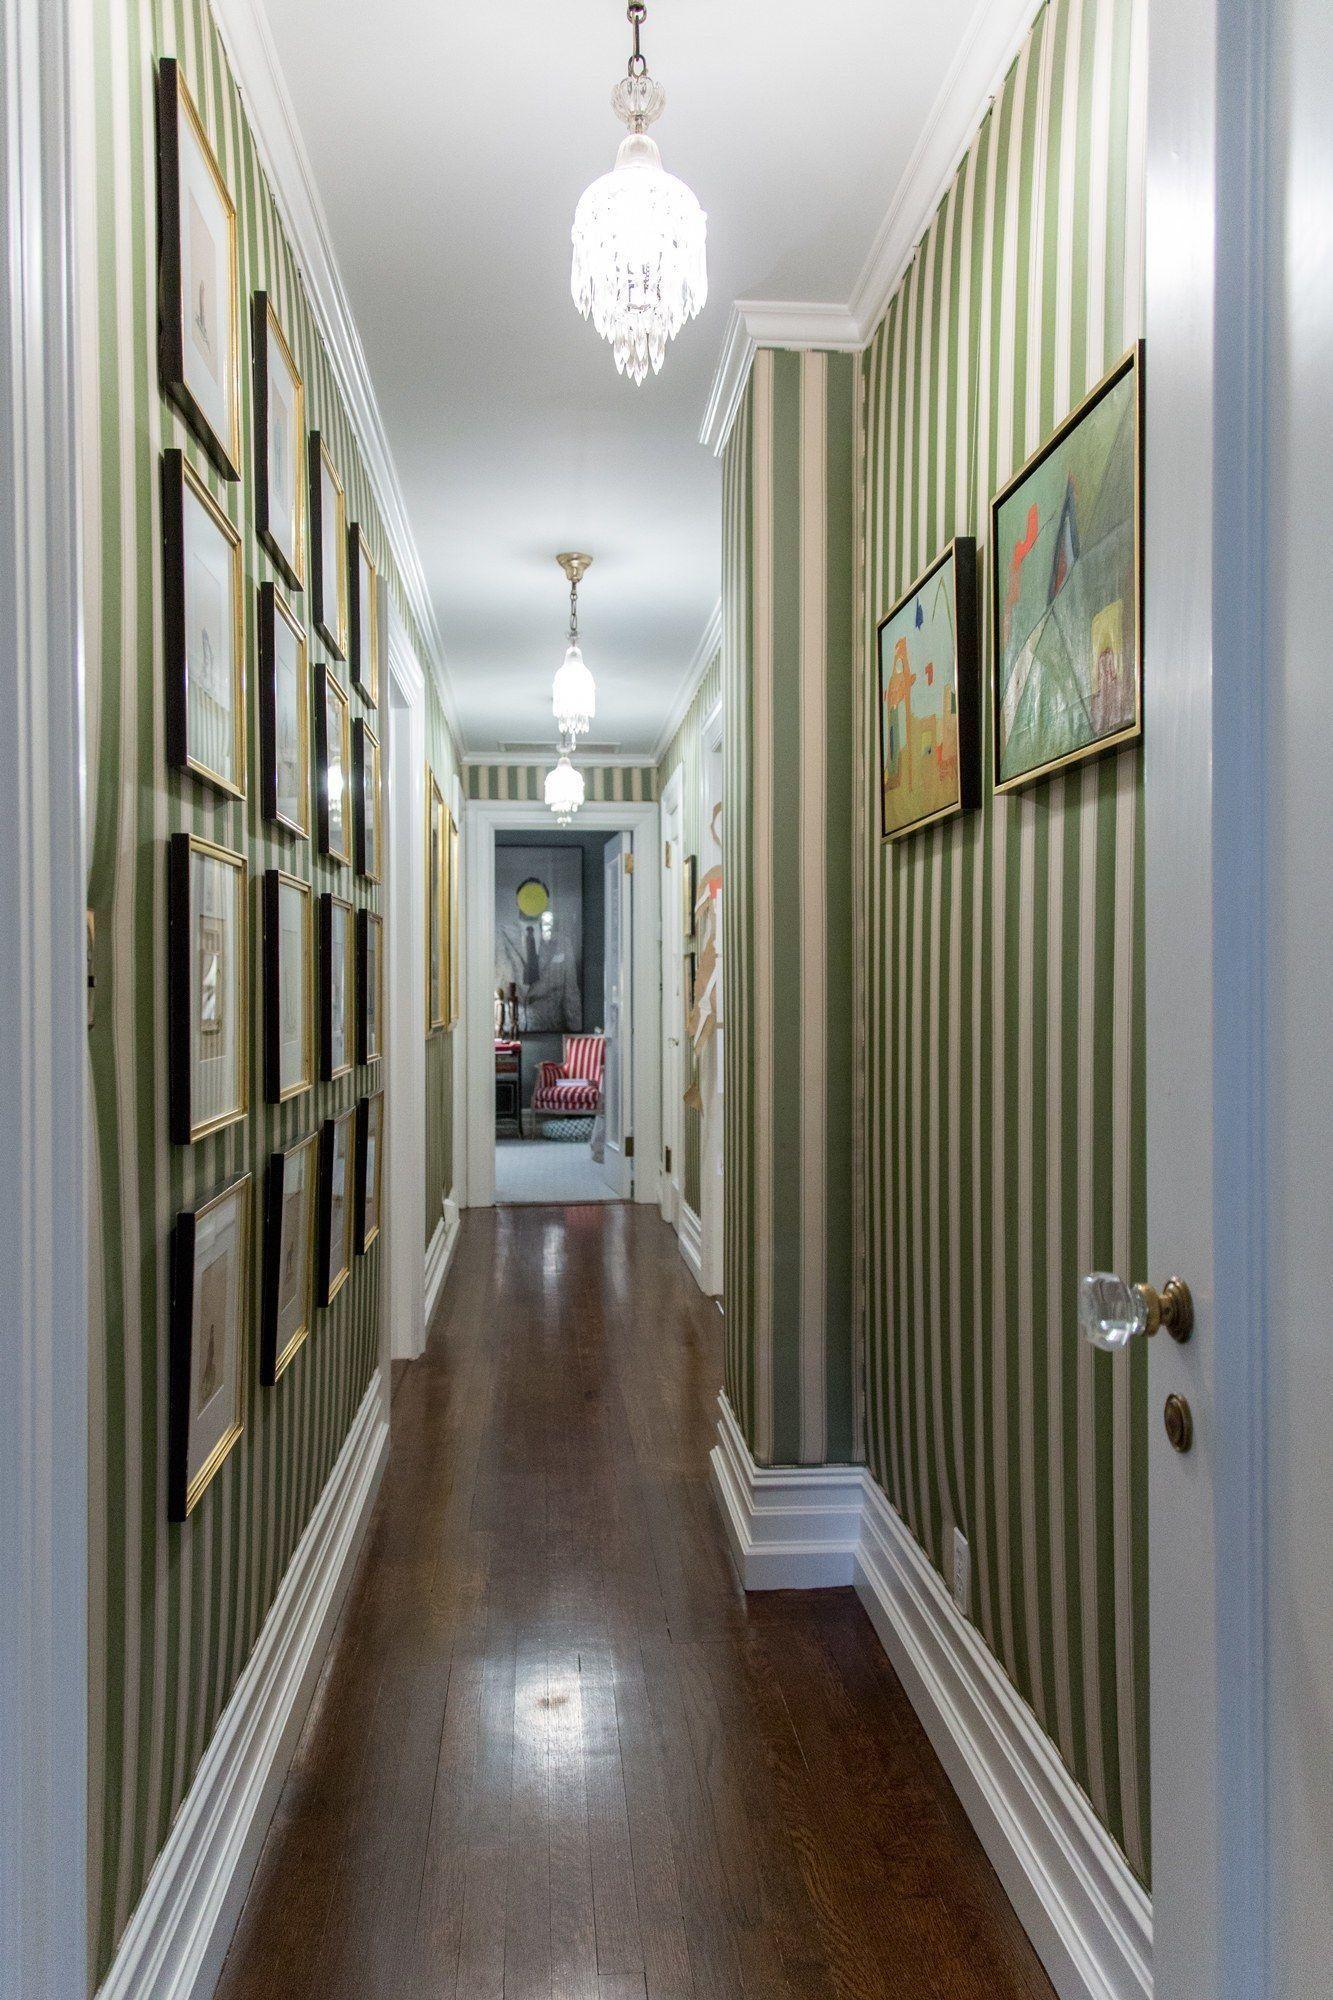 Narrow hallway decor  Narrow Hallway With Striped Walls And Framed Arts Decorating Ideas